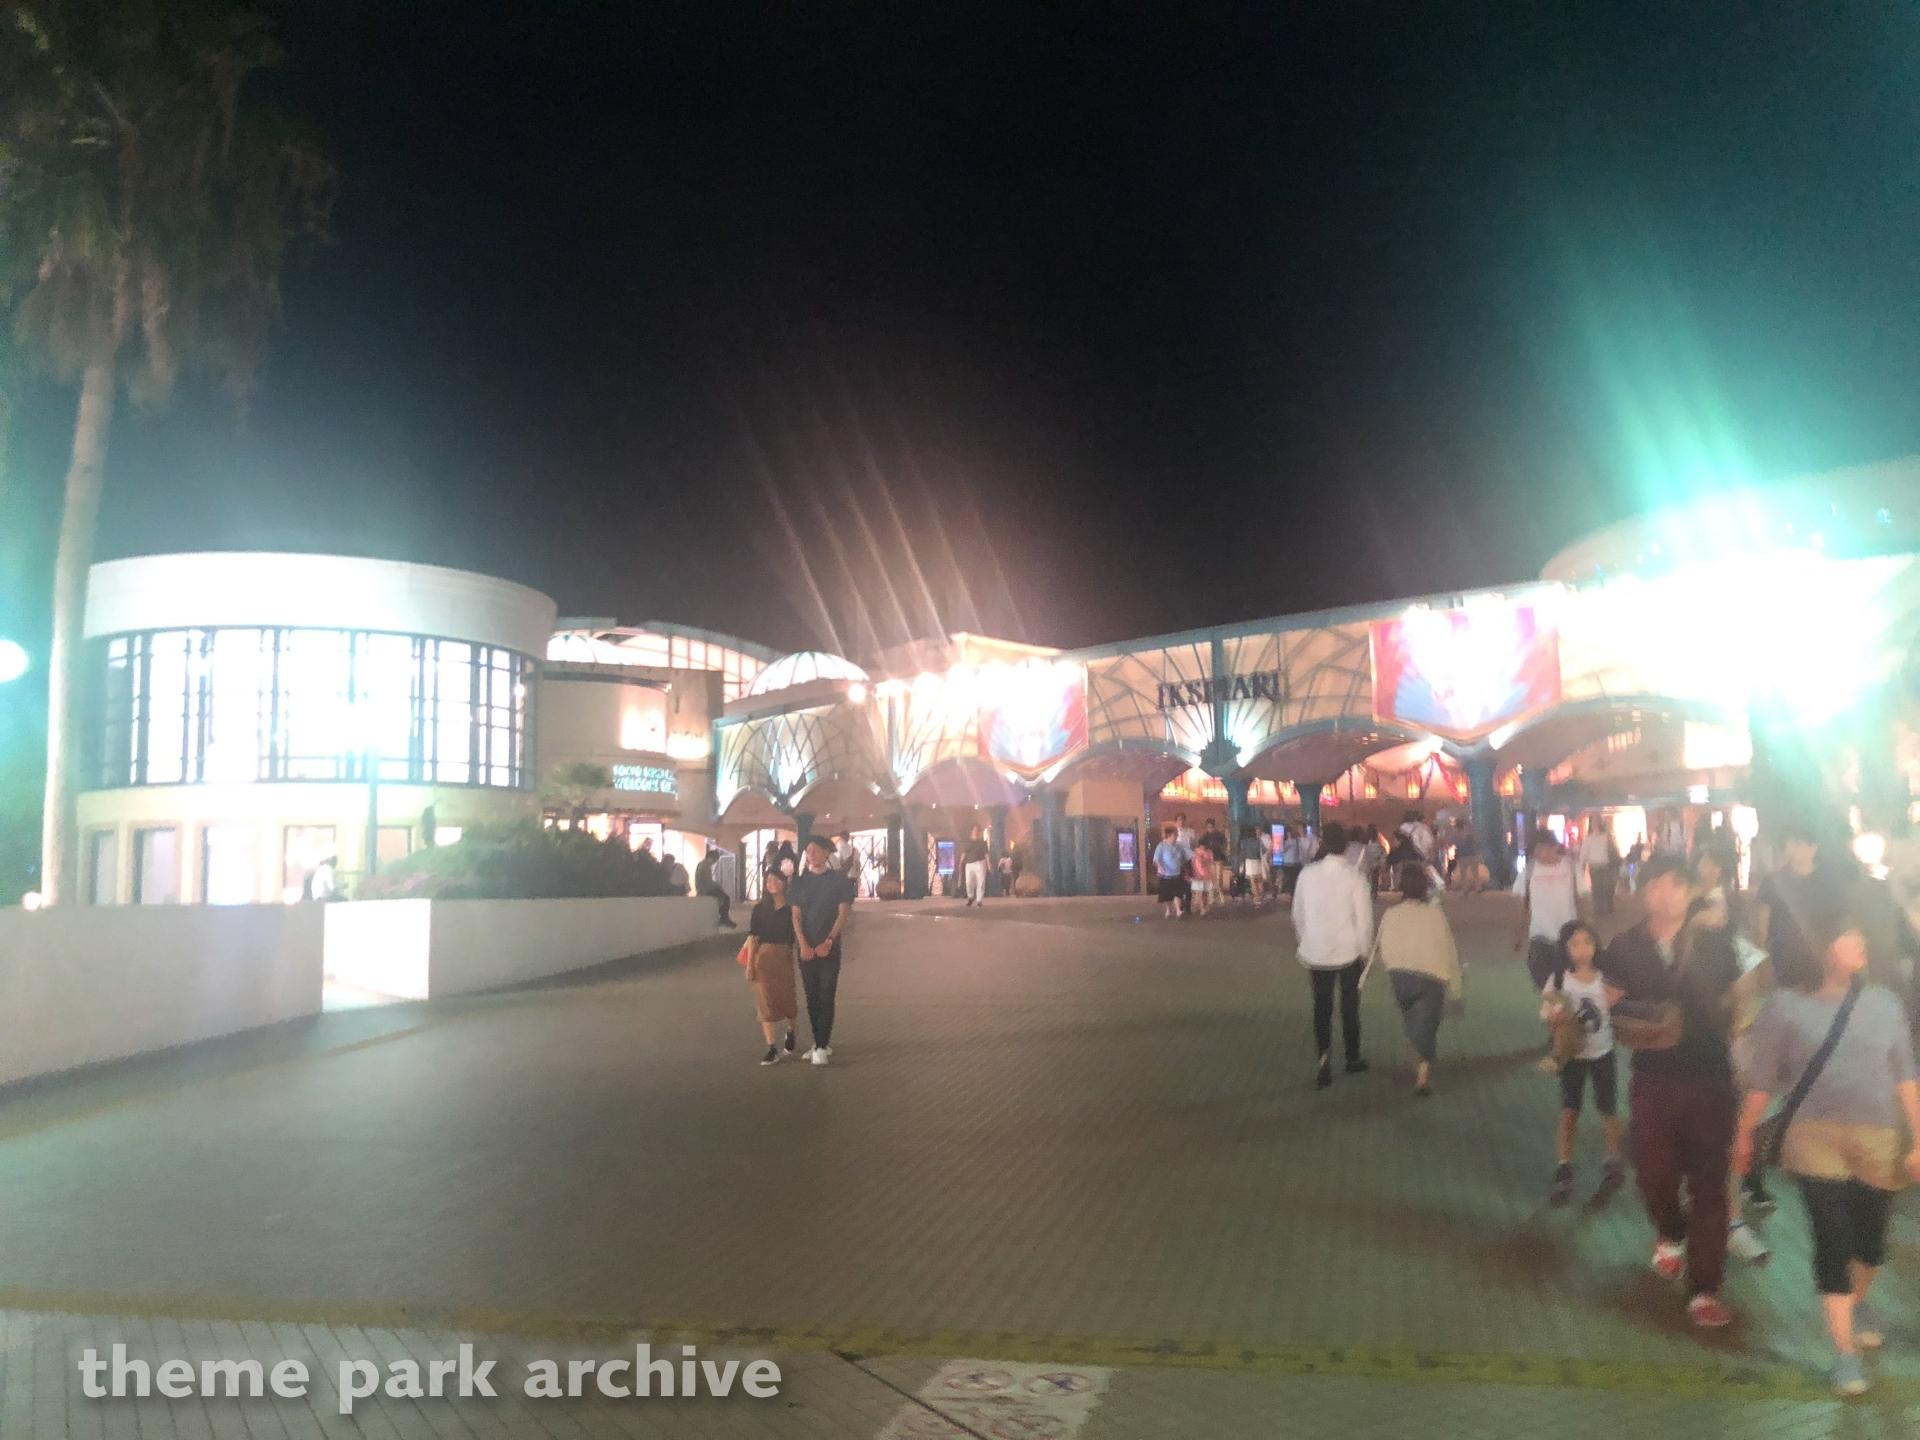 Ikspiari at Tokyo Disney Resort